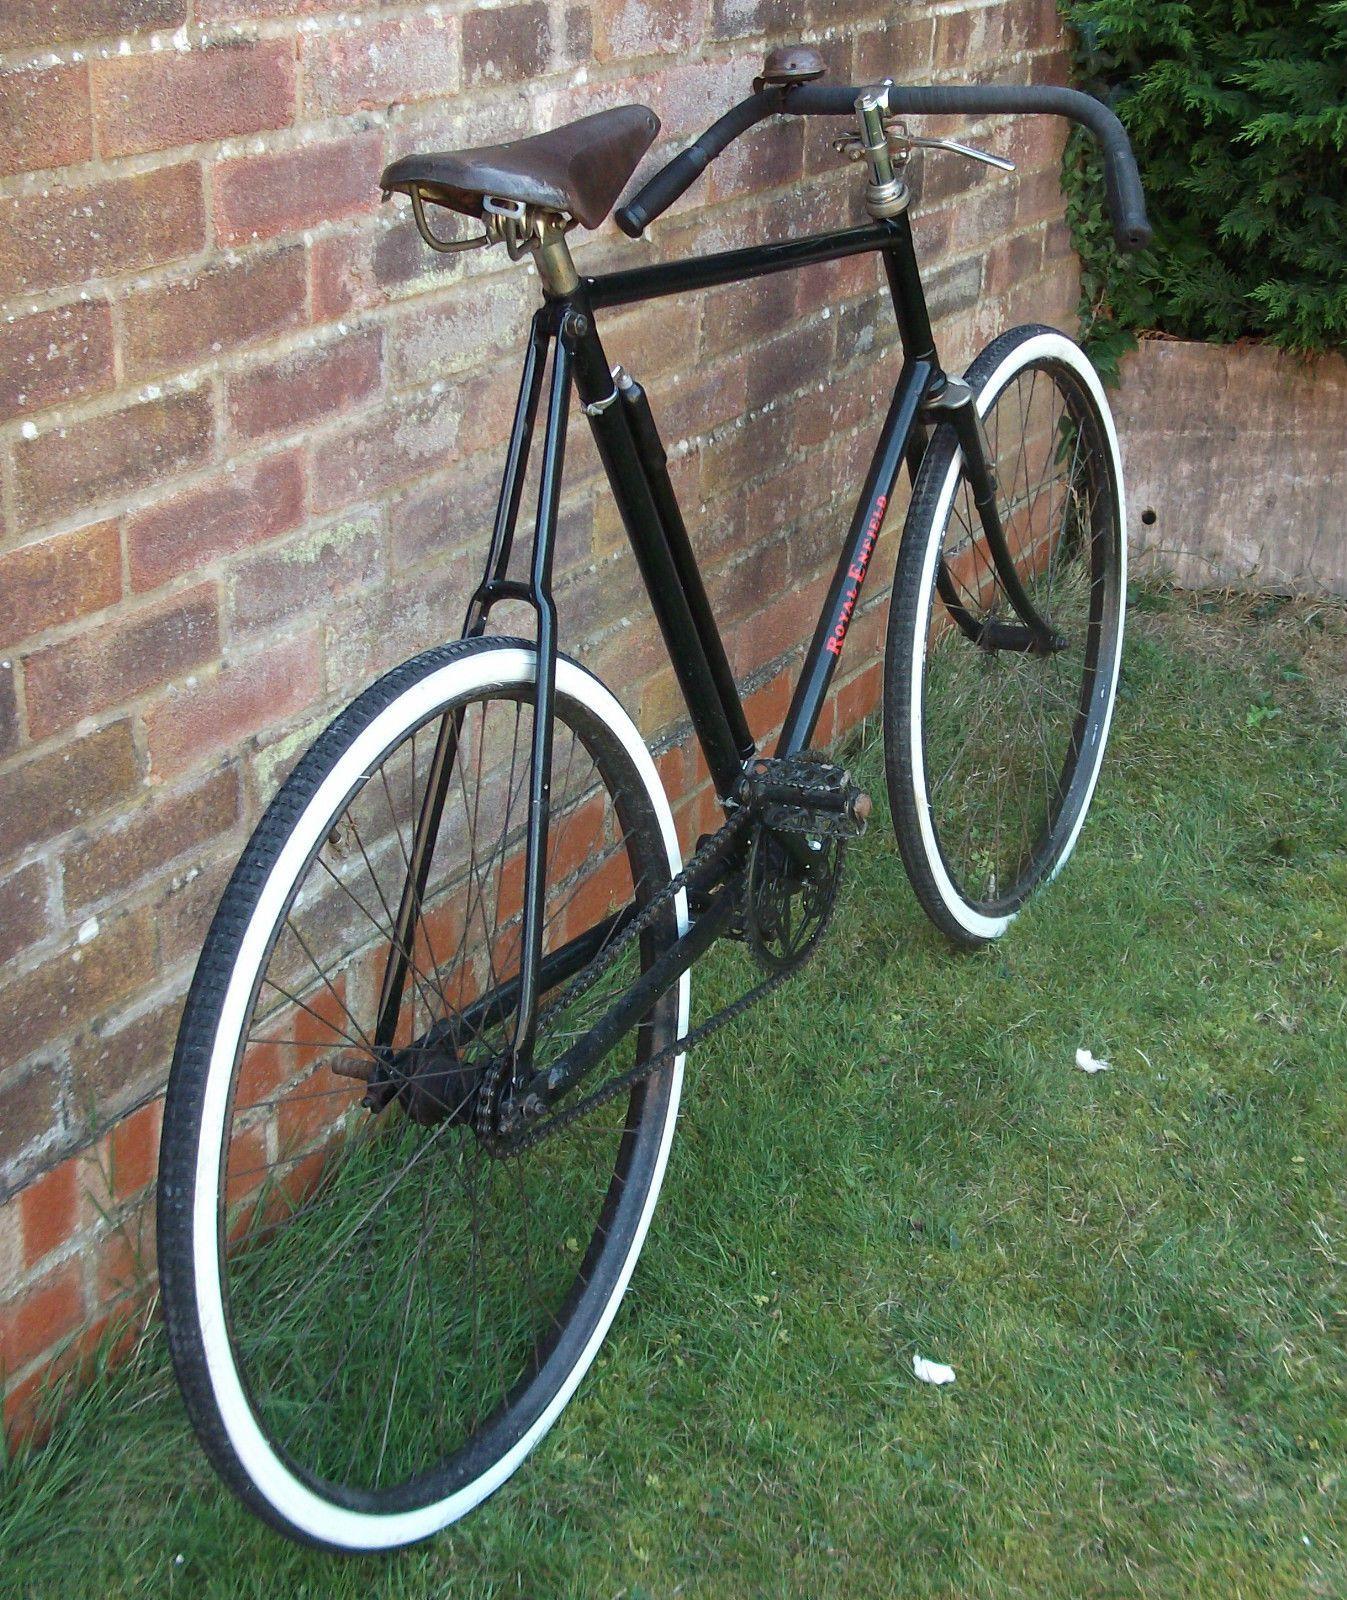 Kjempebra Vintage Veteran Royal Enfield Sloping Top Tube Pathracer Bicycle MF-08